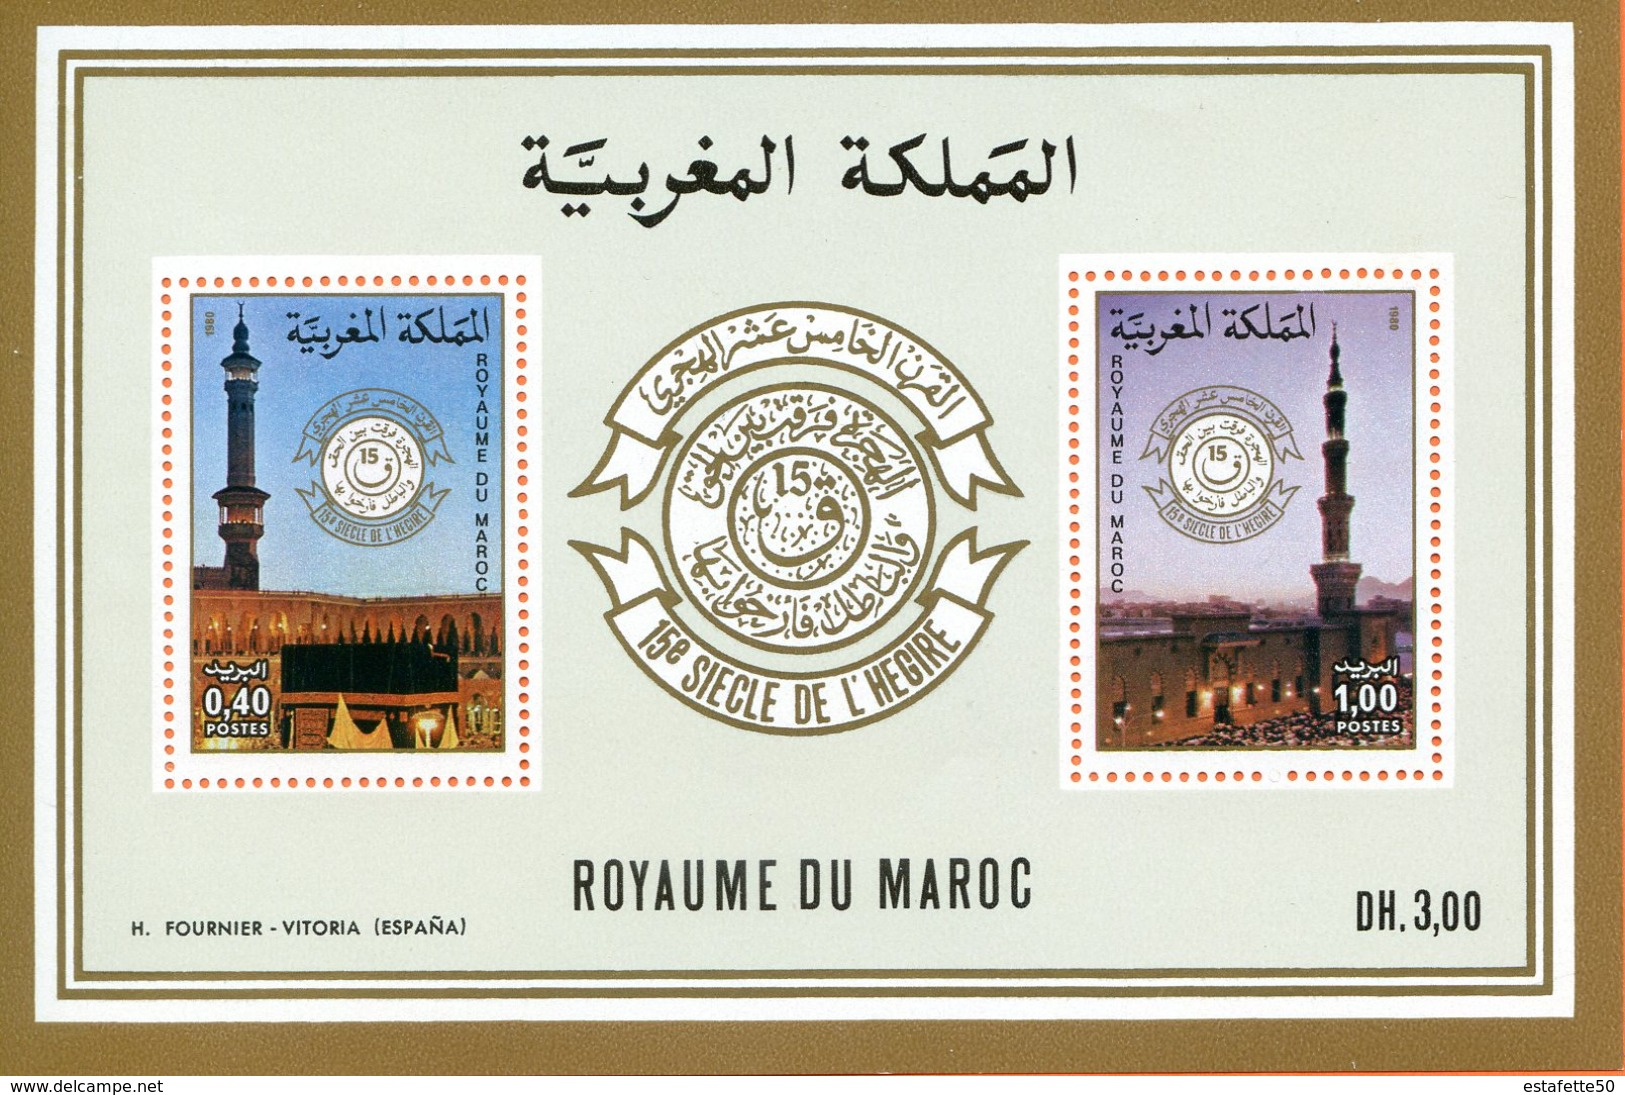 "Maroc,1981; Bloc Feuillet,BF N° 11 "" 15ème Siècle De L'hégire "" Neuf**,MNH;Morocco,Marruecos - Maroc (1956-...)"